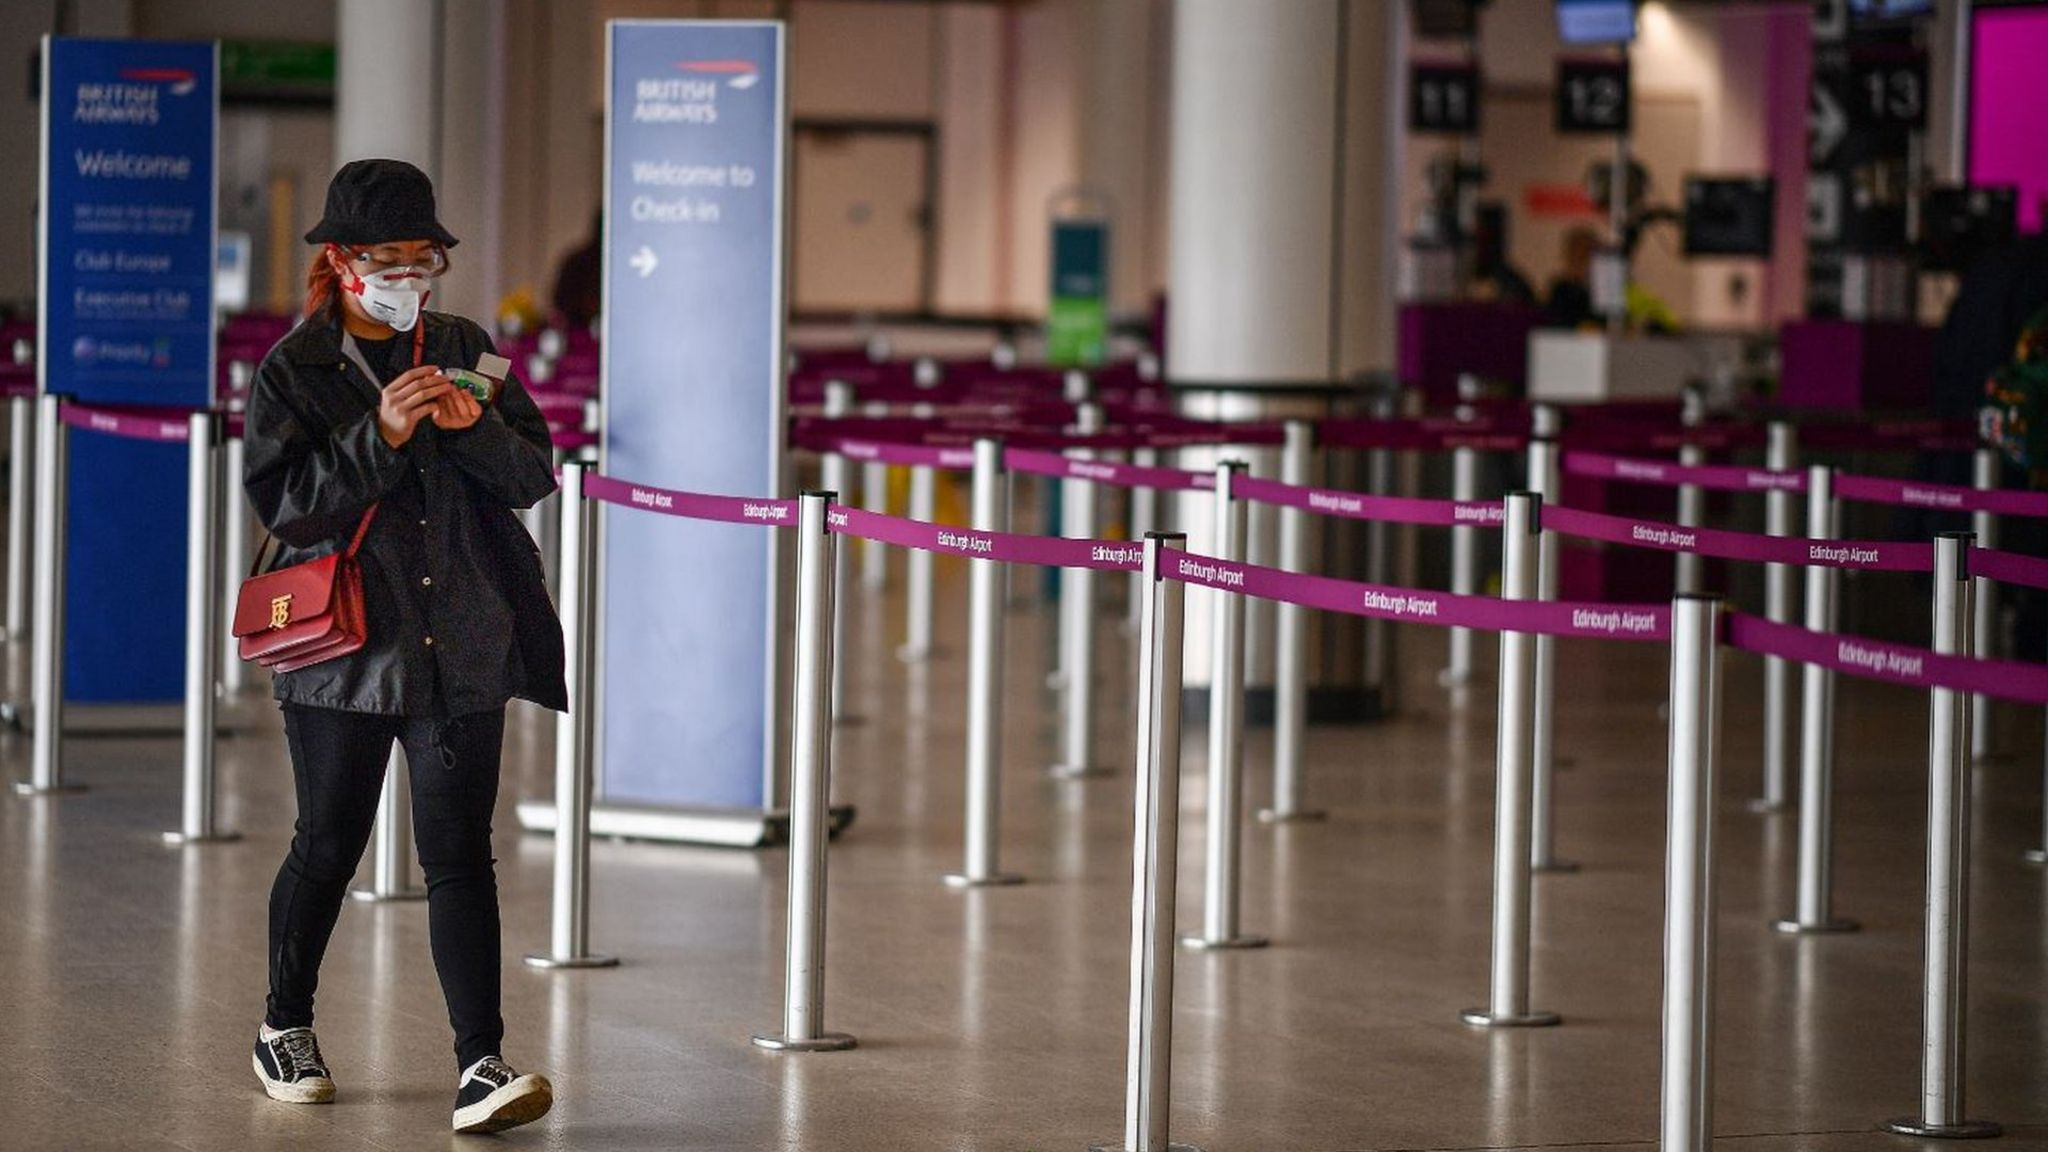 Passenger arrives at Edinburgh